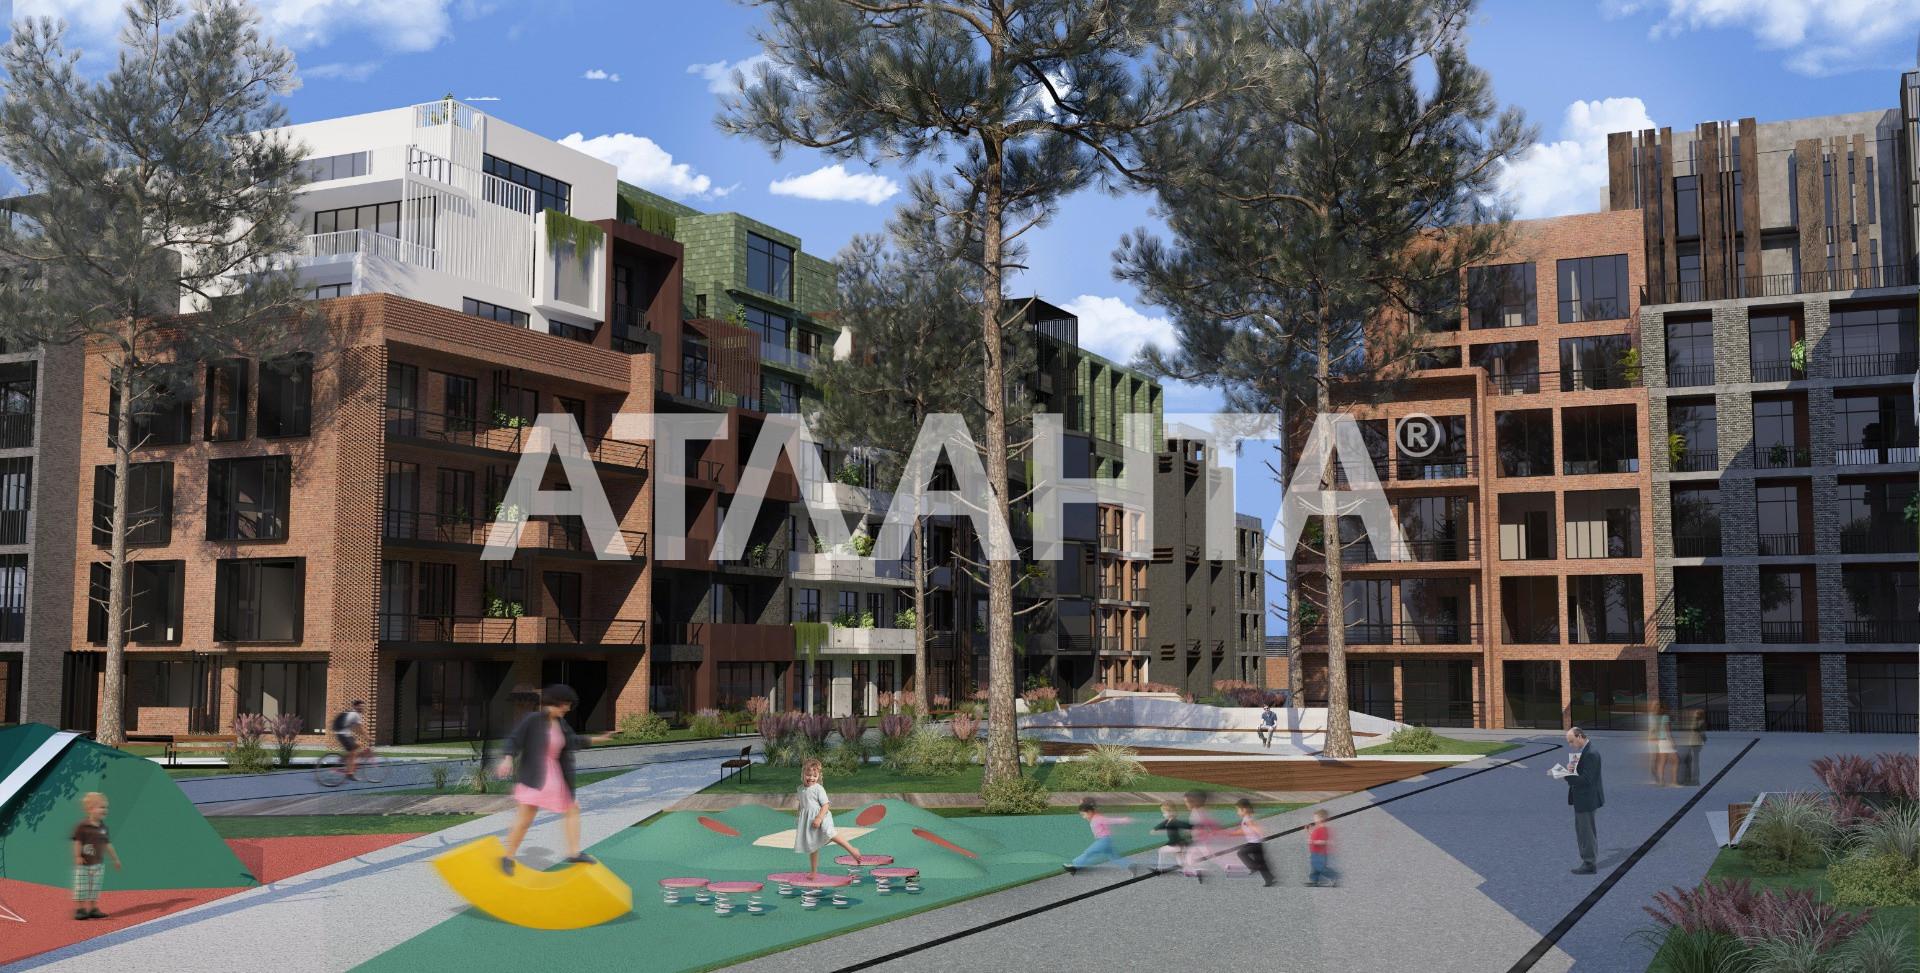 Продается 1-комнатная Квартира на ул. Донского Дмитрия — 71 280 у.е. (фото №2)